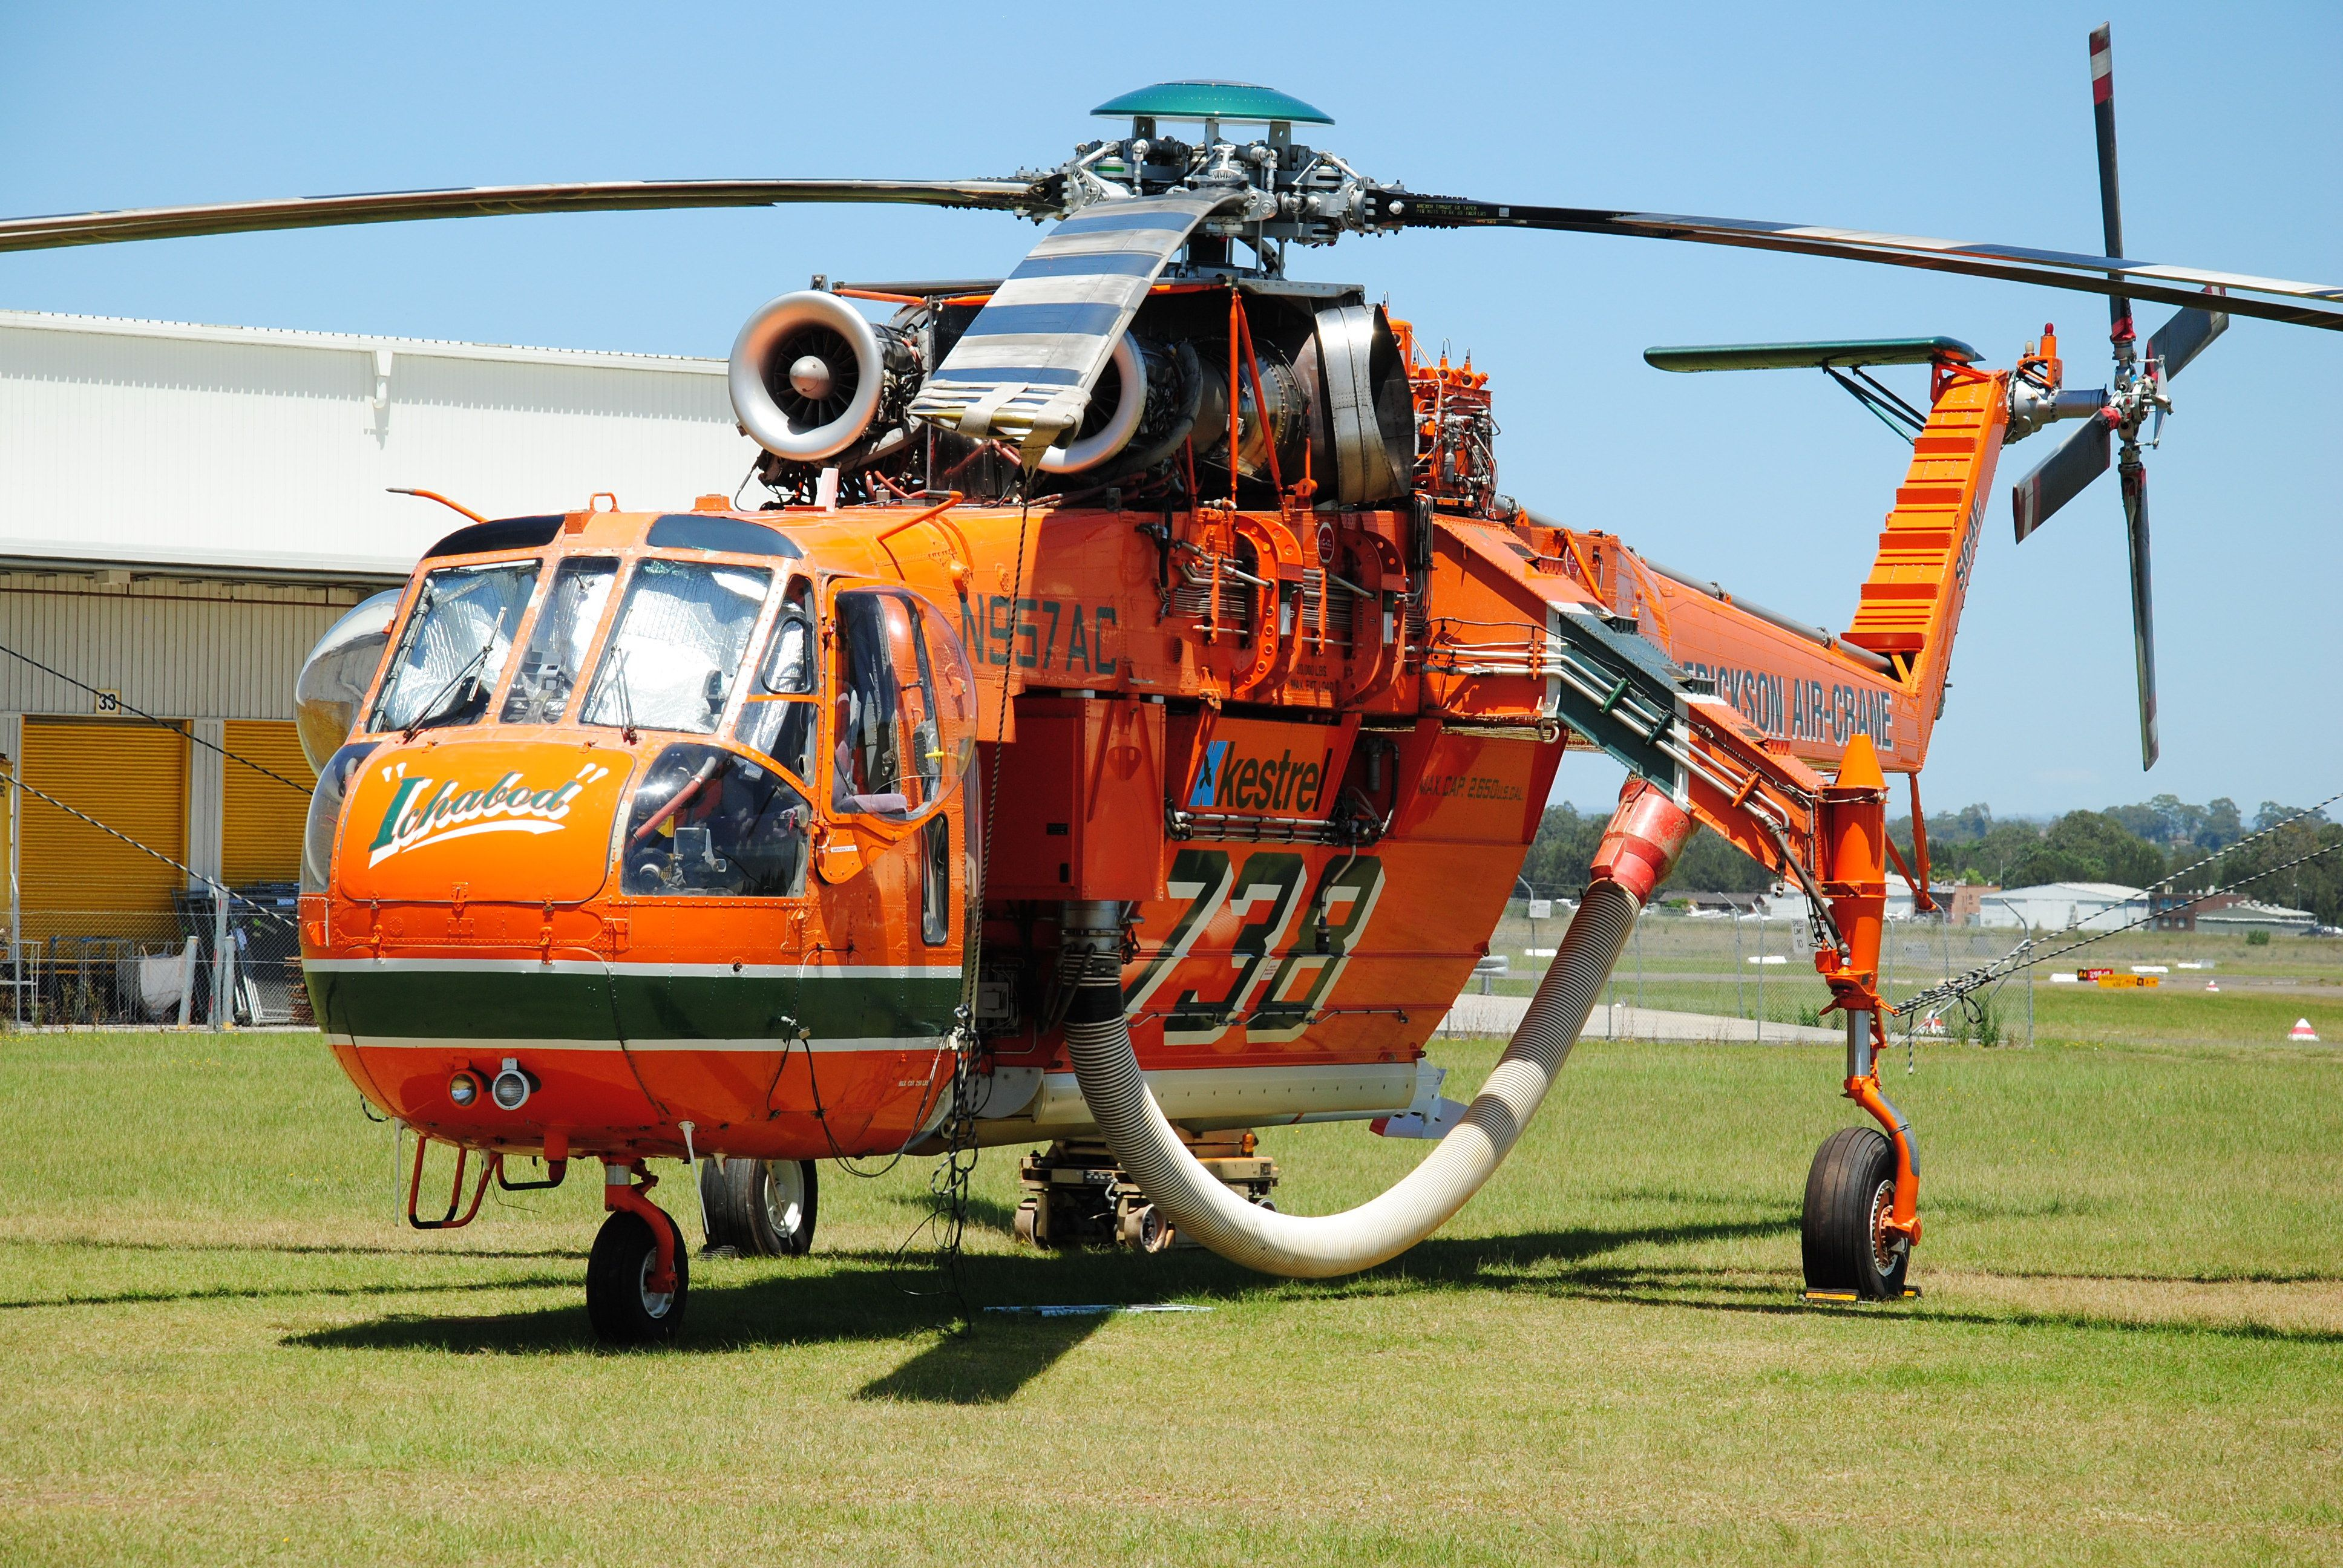 Erickson S64 Aircrane N957AC Ichabod at Bankstown Airport